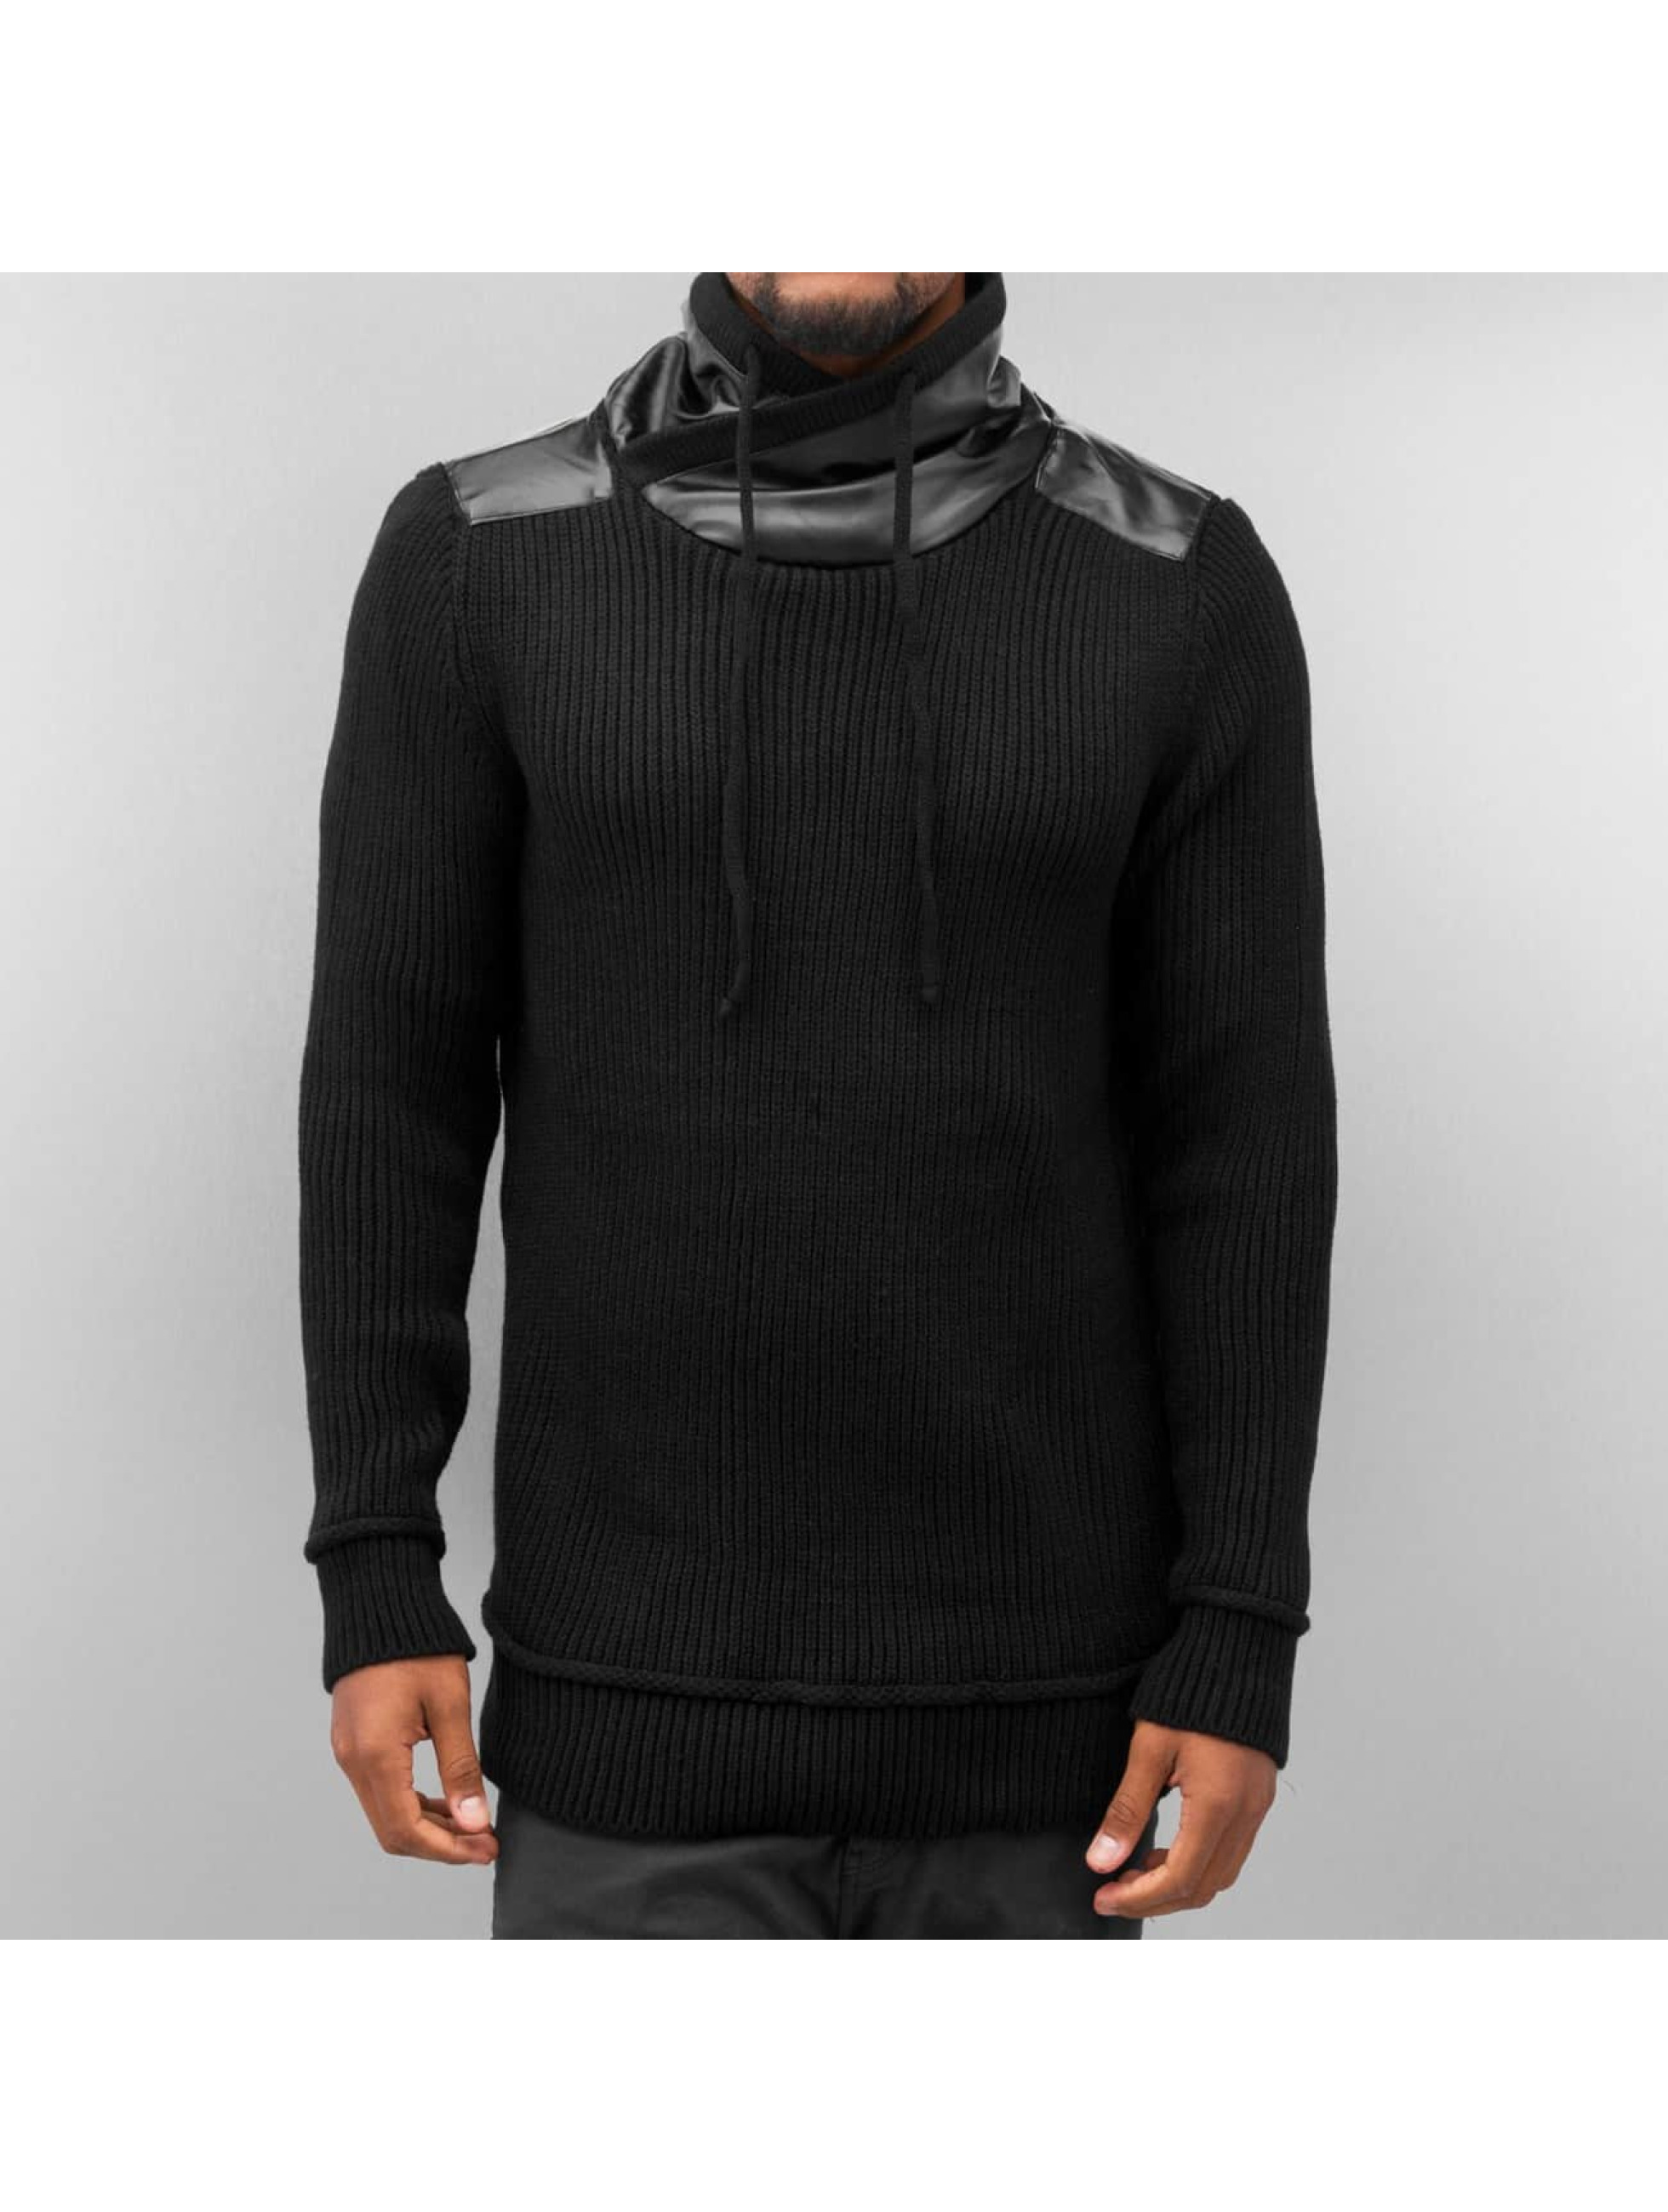 Neiße-Malxetal Angebote Bangastic Männer Pullover Knitted in schwarz